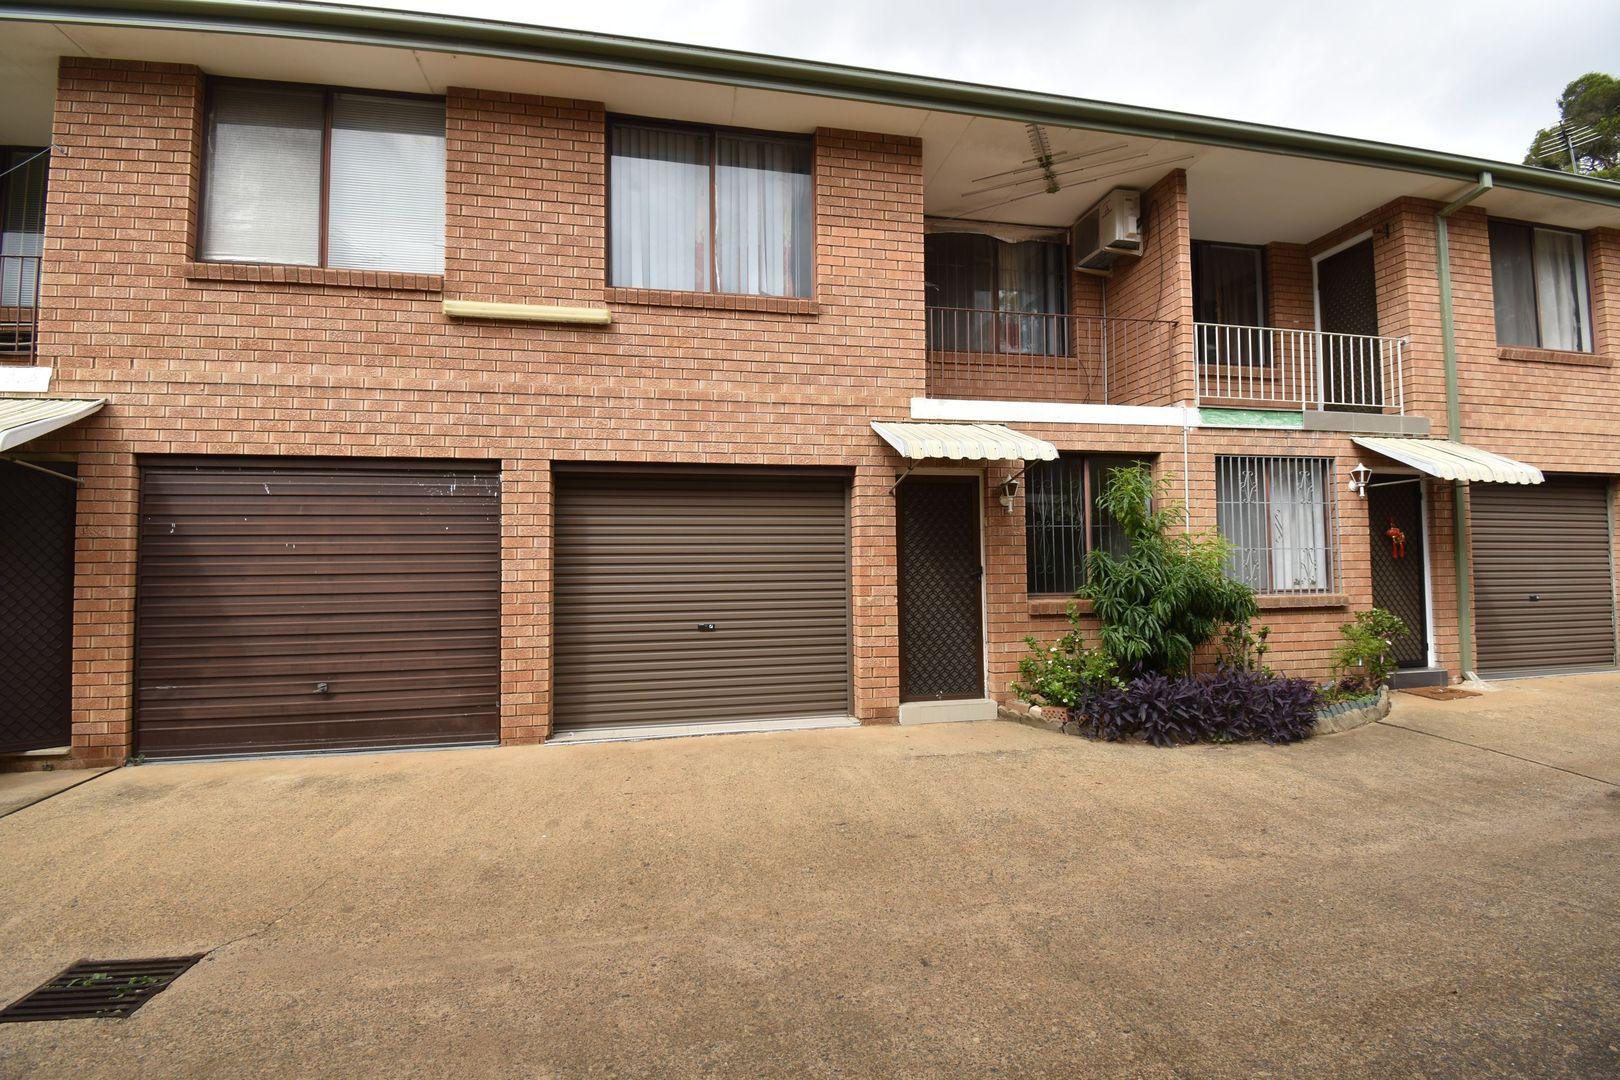 13/7-9 Gilmore Street, Cabramatta NSW 2166, Image 0